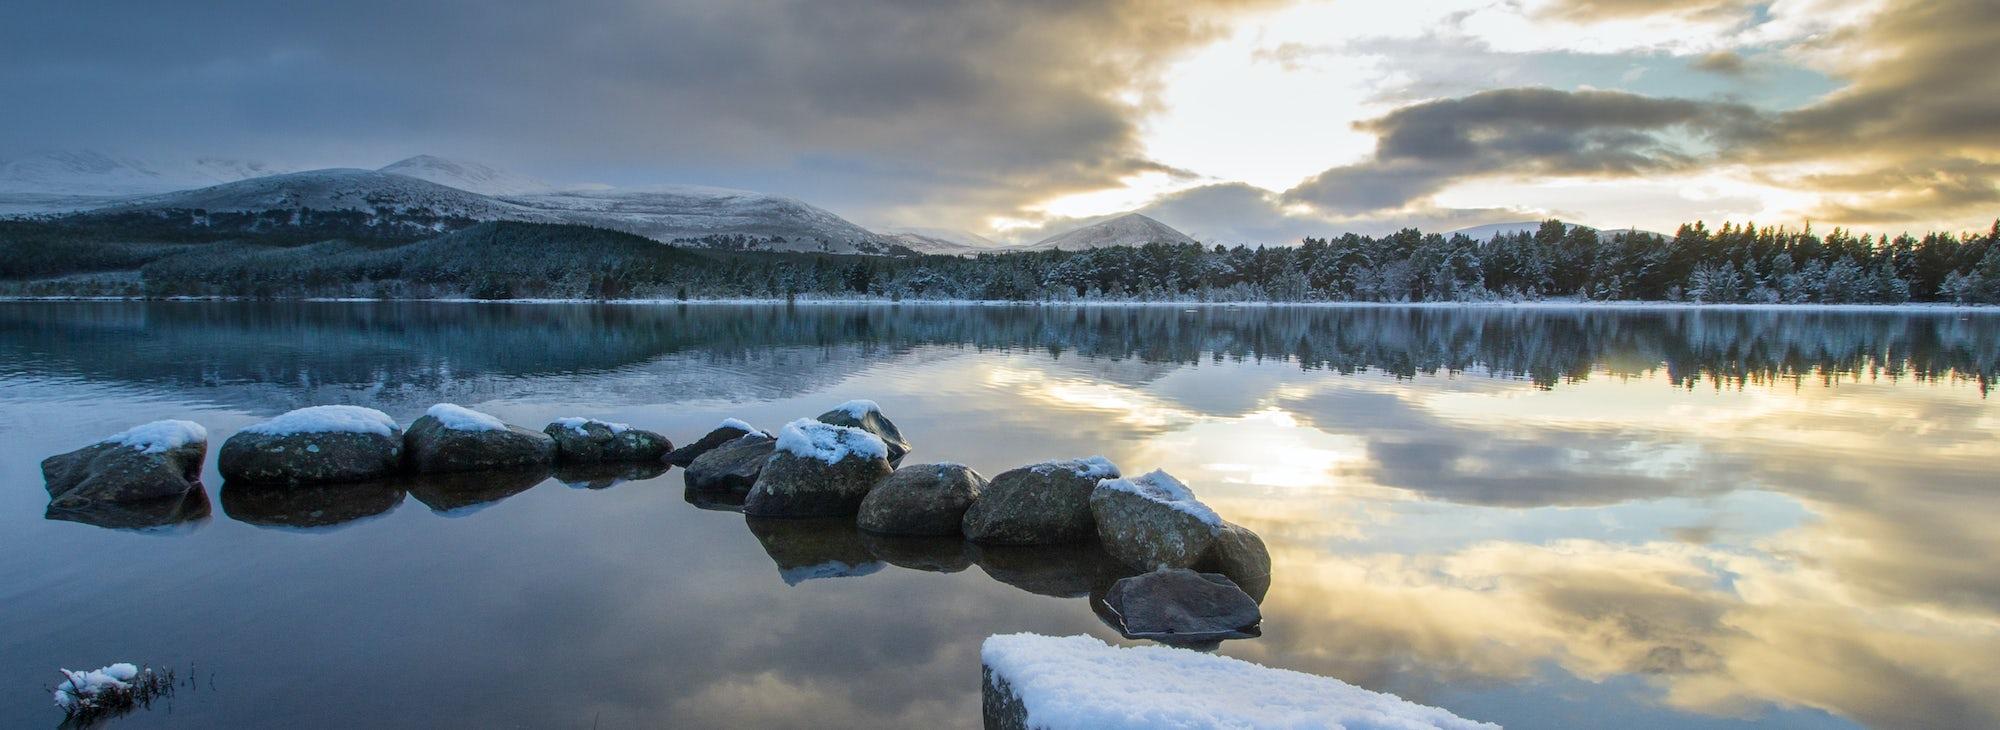 Loch Morlich with Snowy Landscape